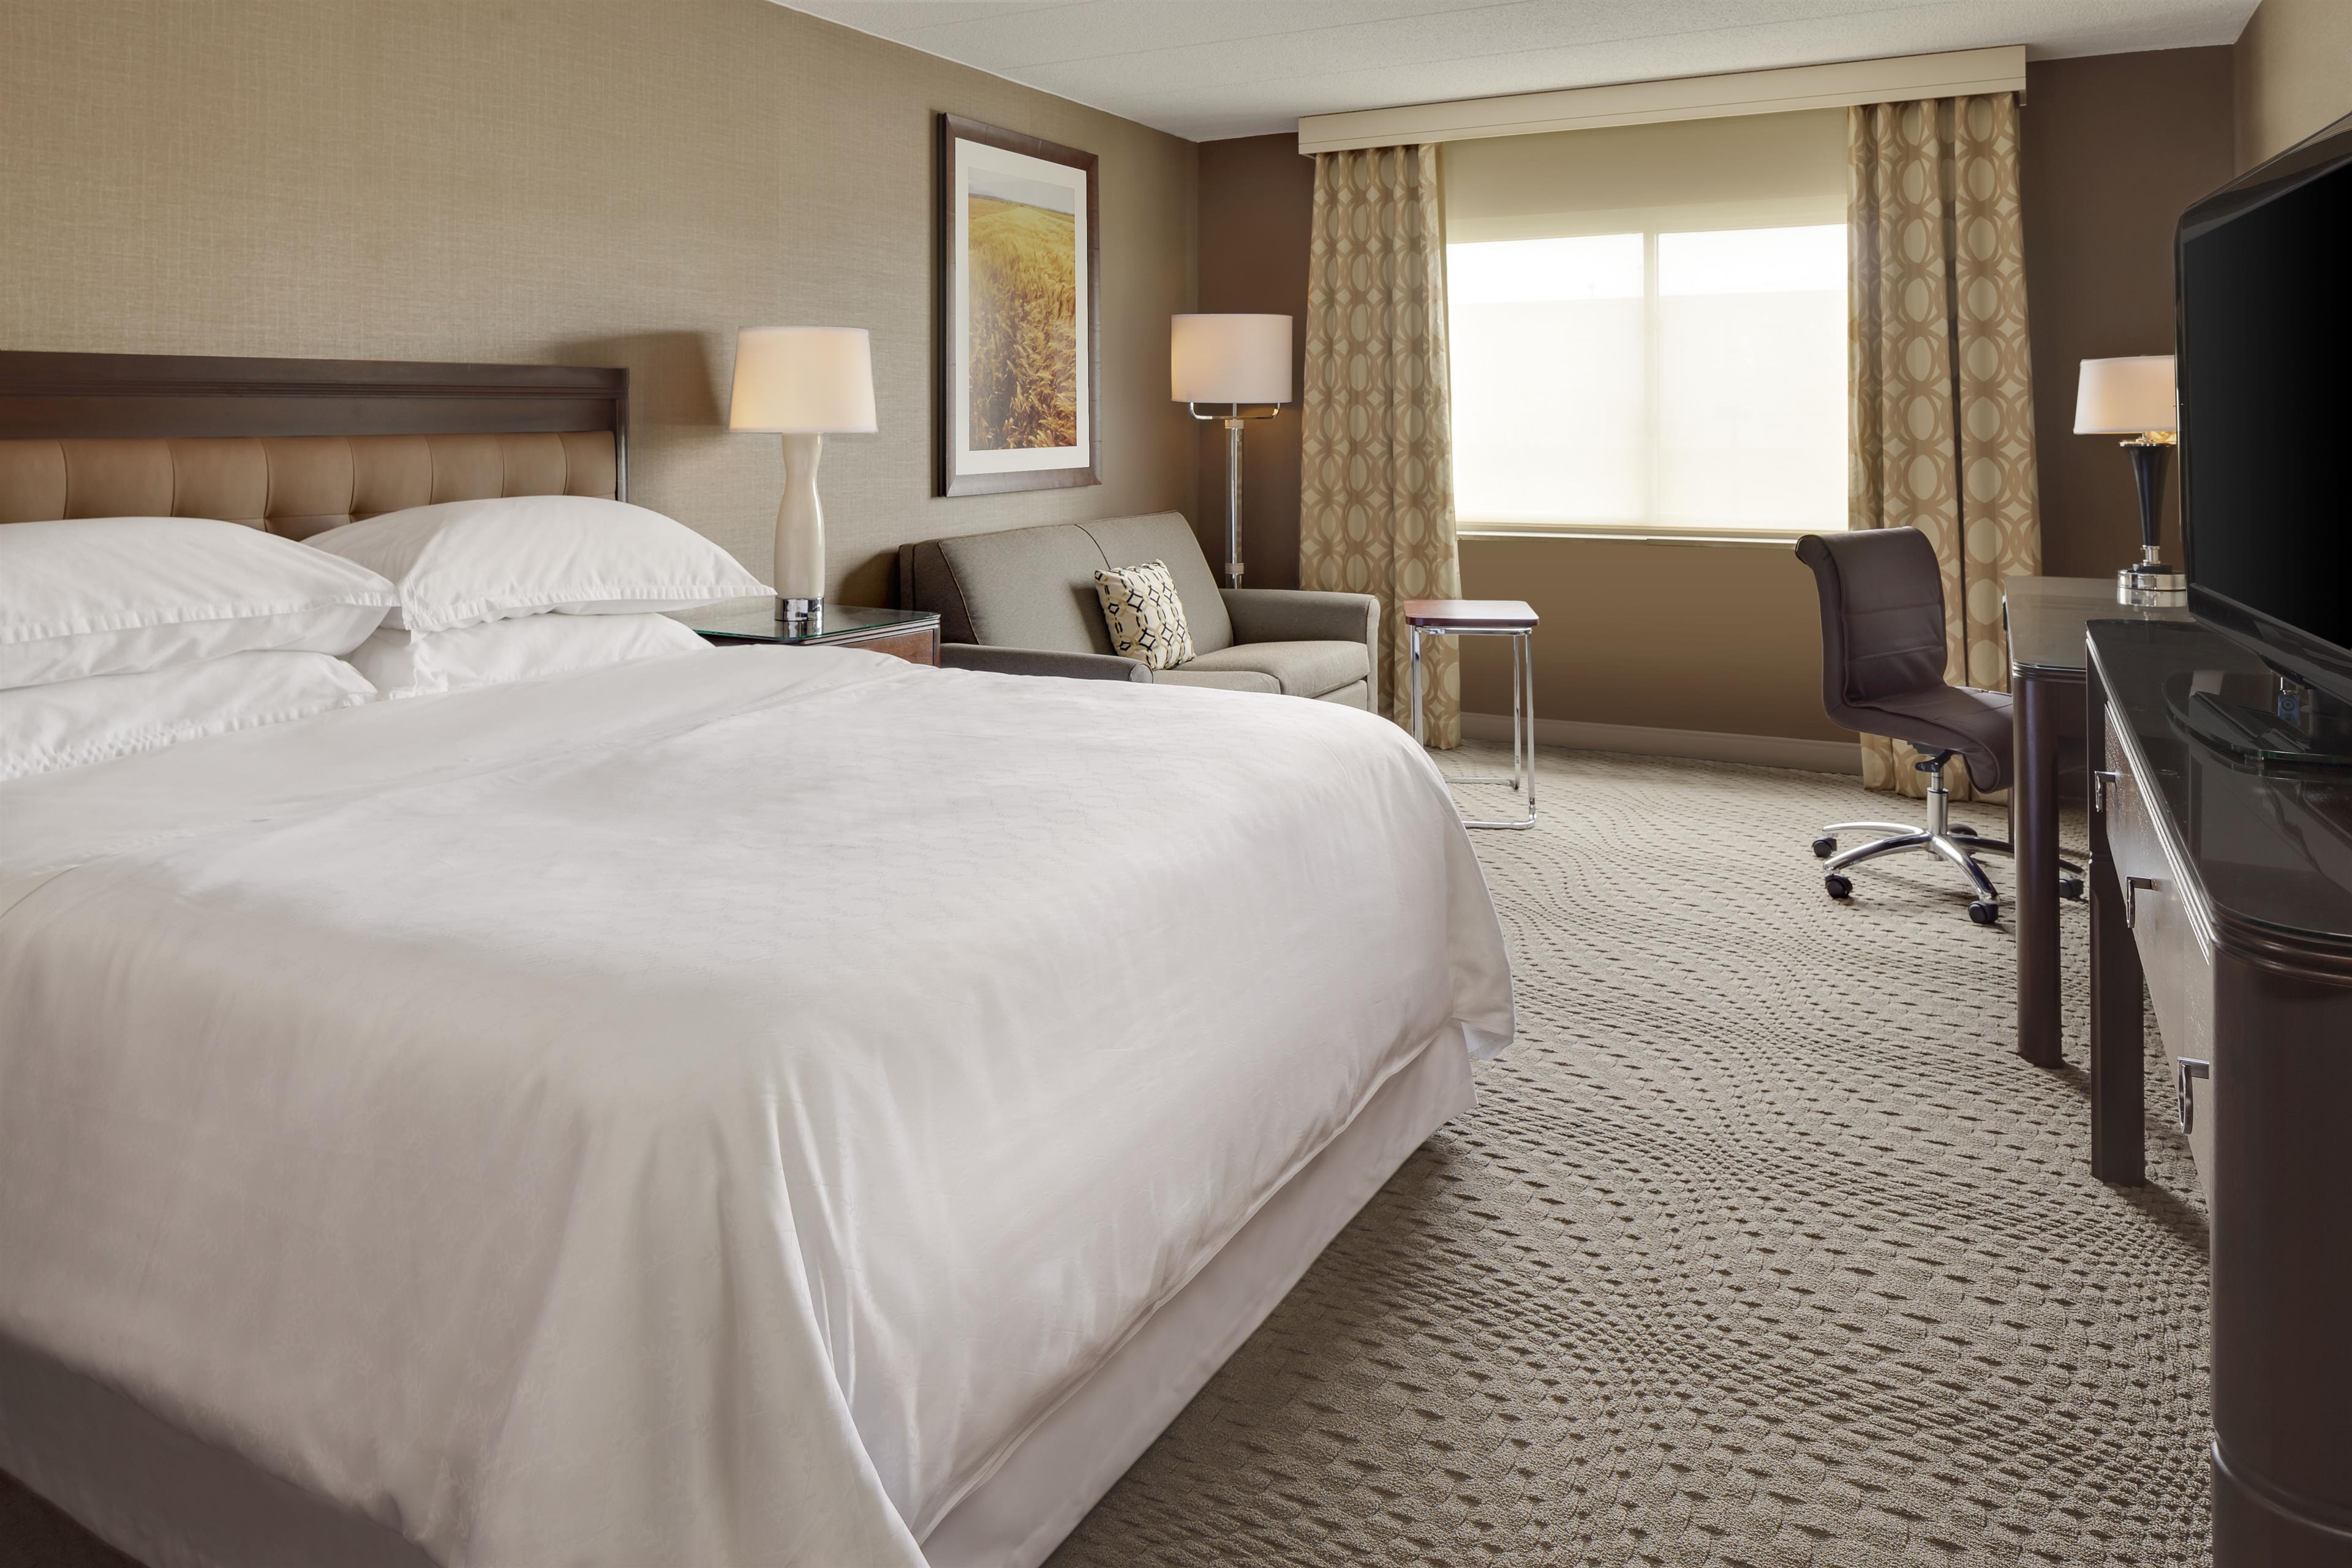 Sheraton Omaha Hotel image 2